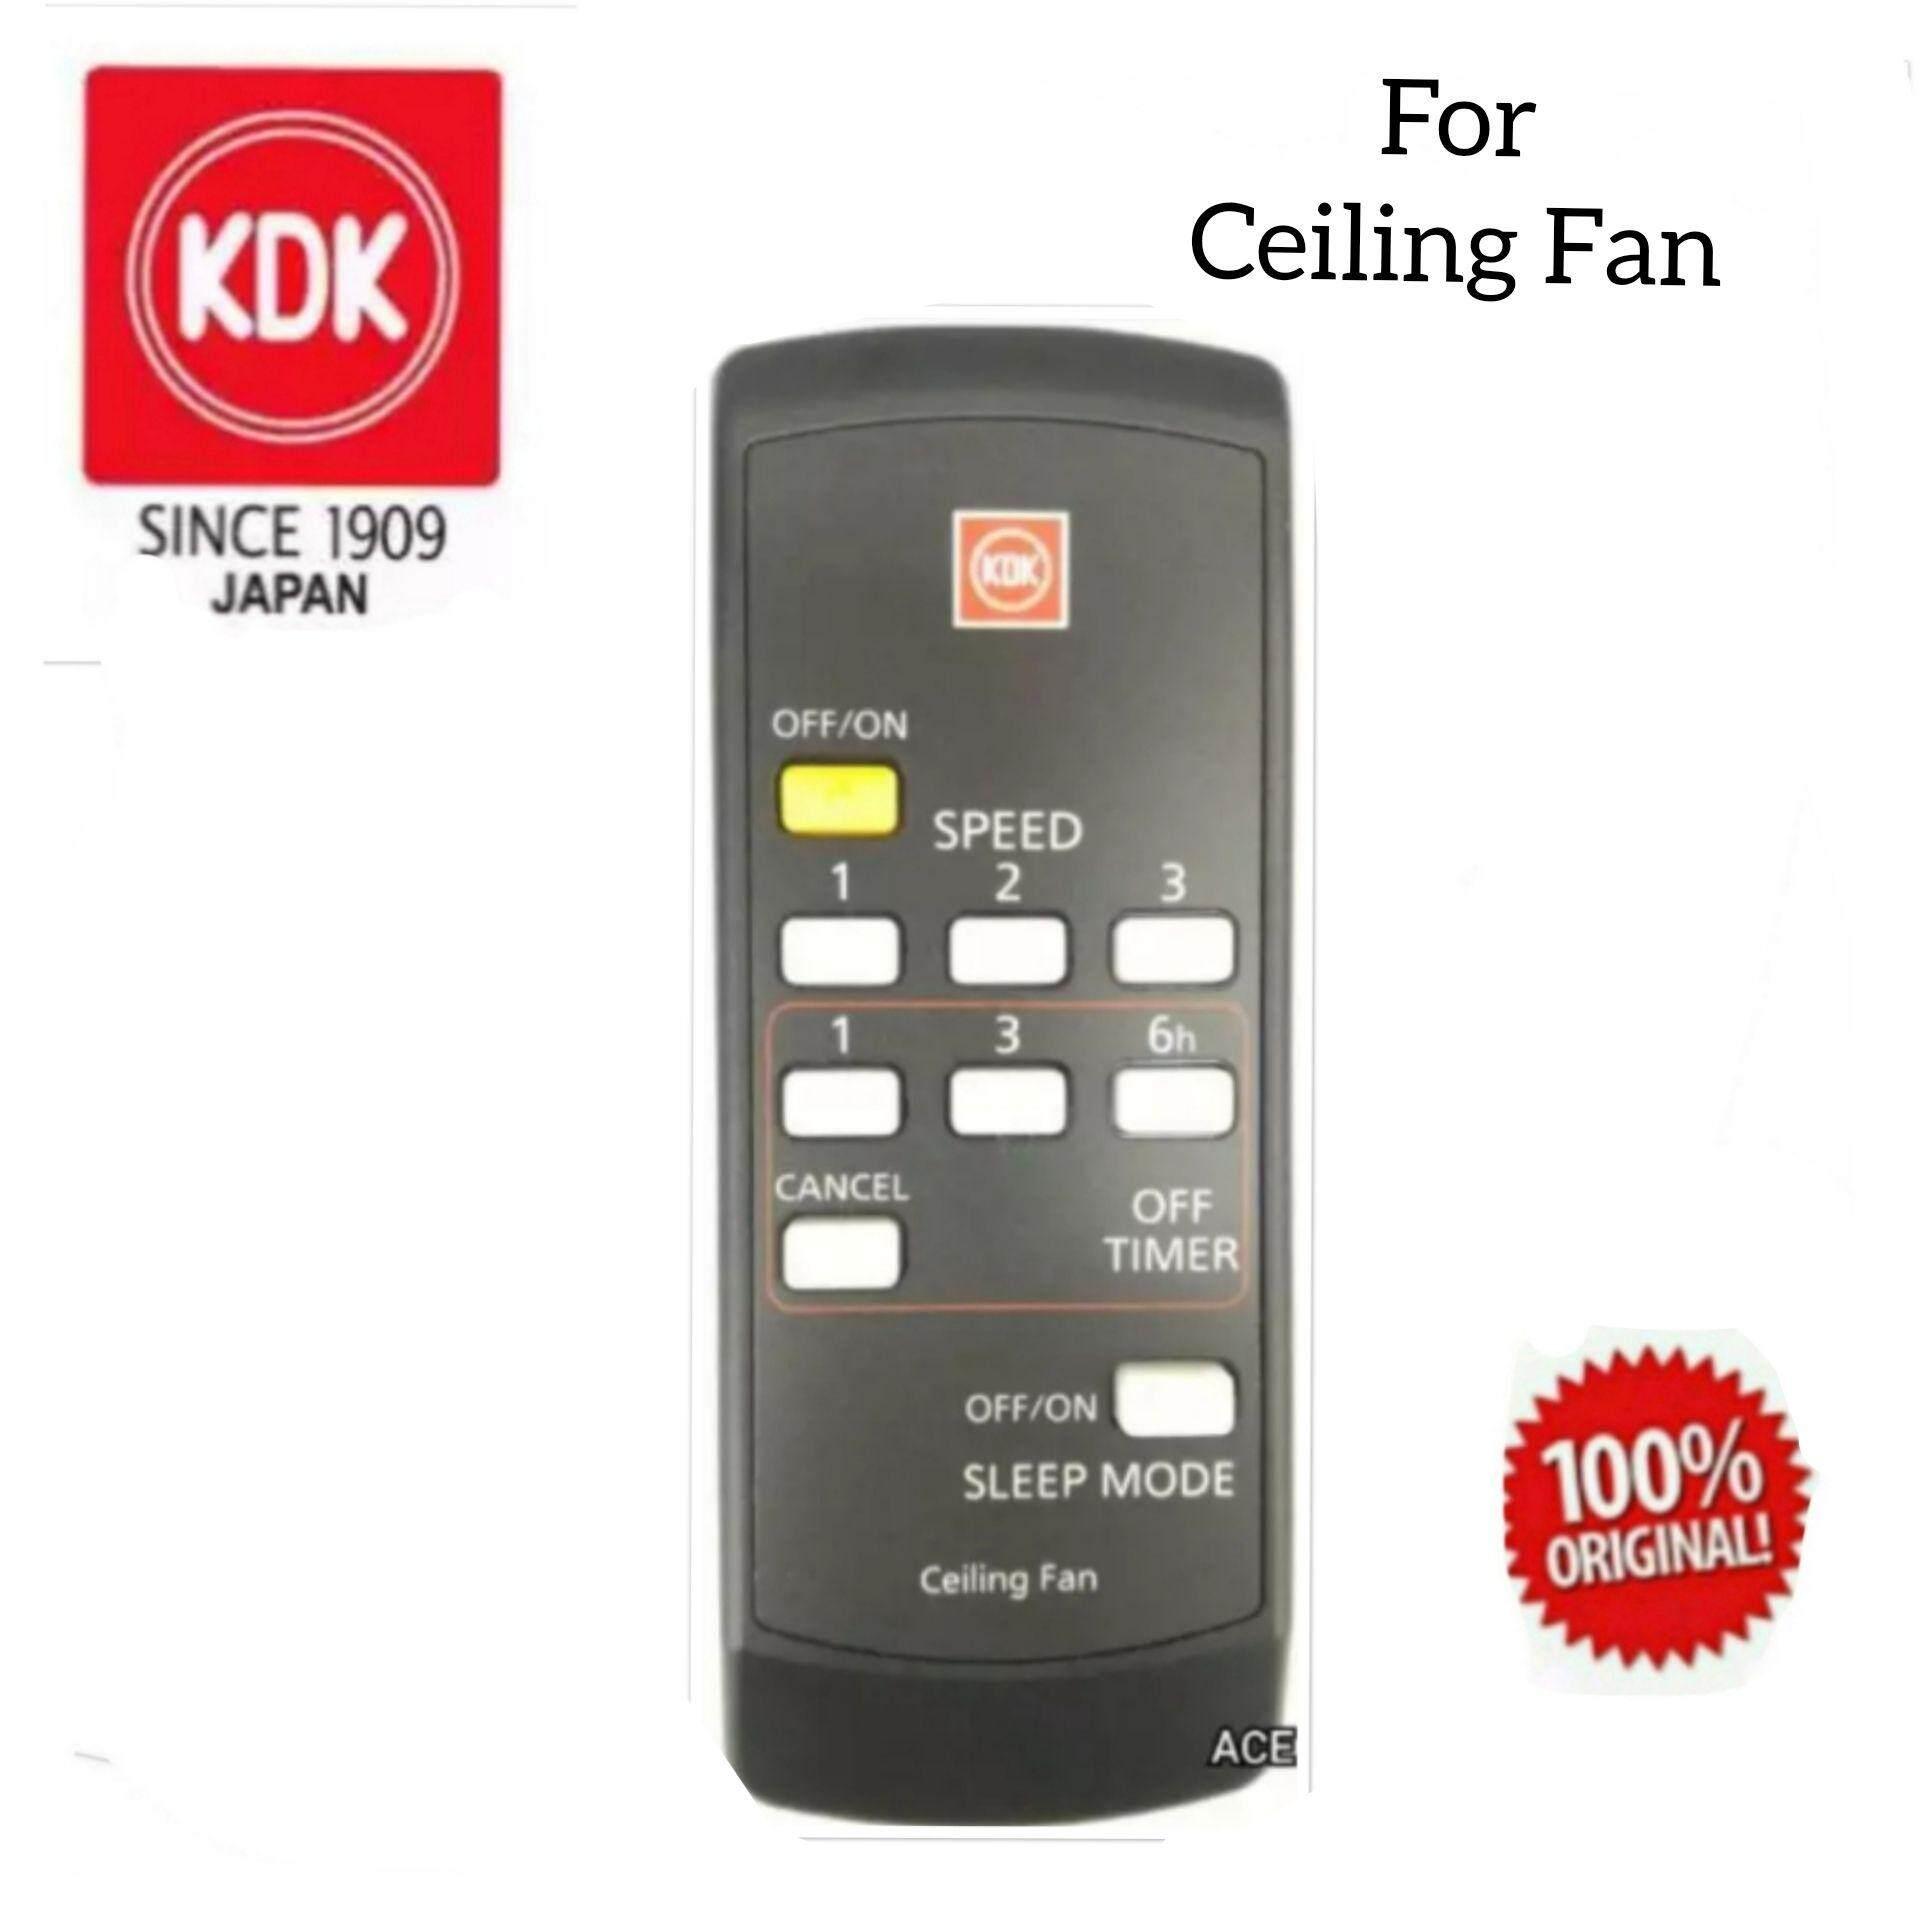 Kdk Original Ceiling Fan Remote Control 4ck12muse For K14y9 K14x8 Gy